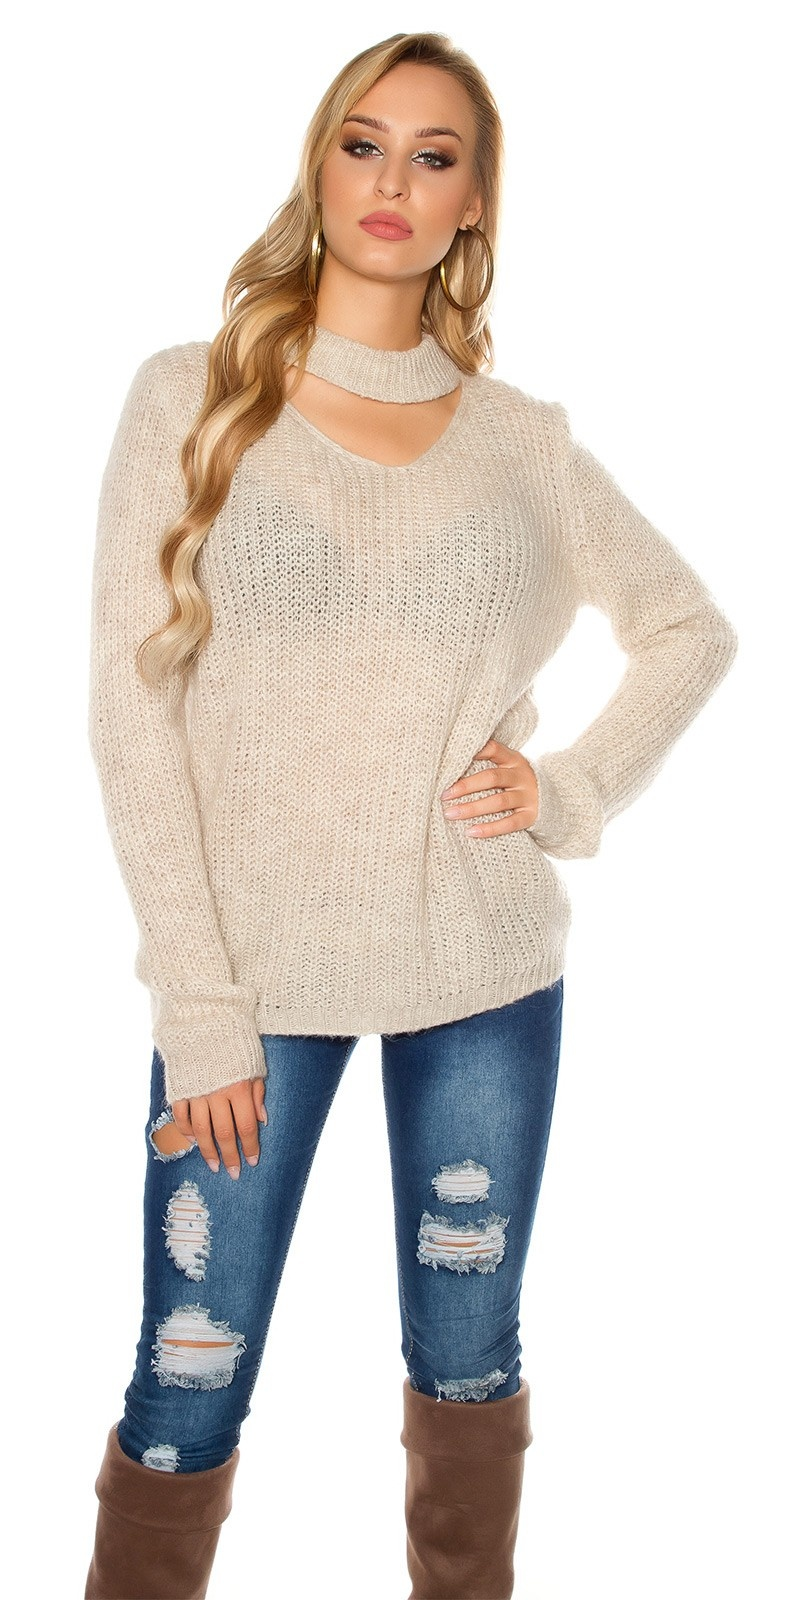 Trendy xl grof gebreide mohair sweater-trui met uitsparing beige